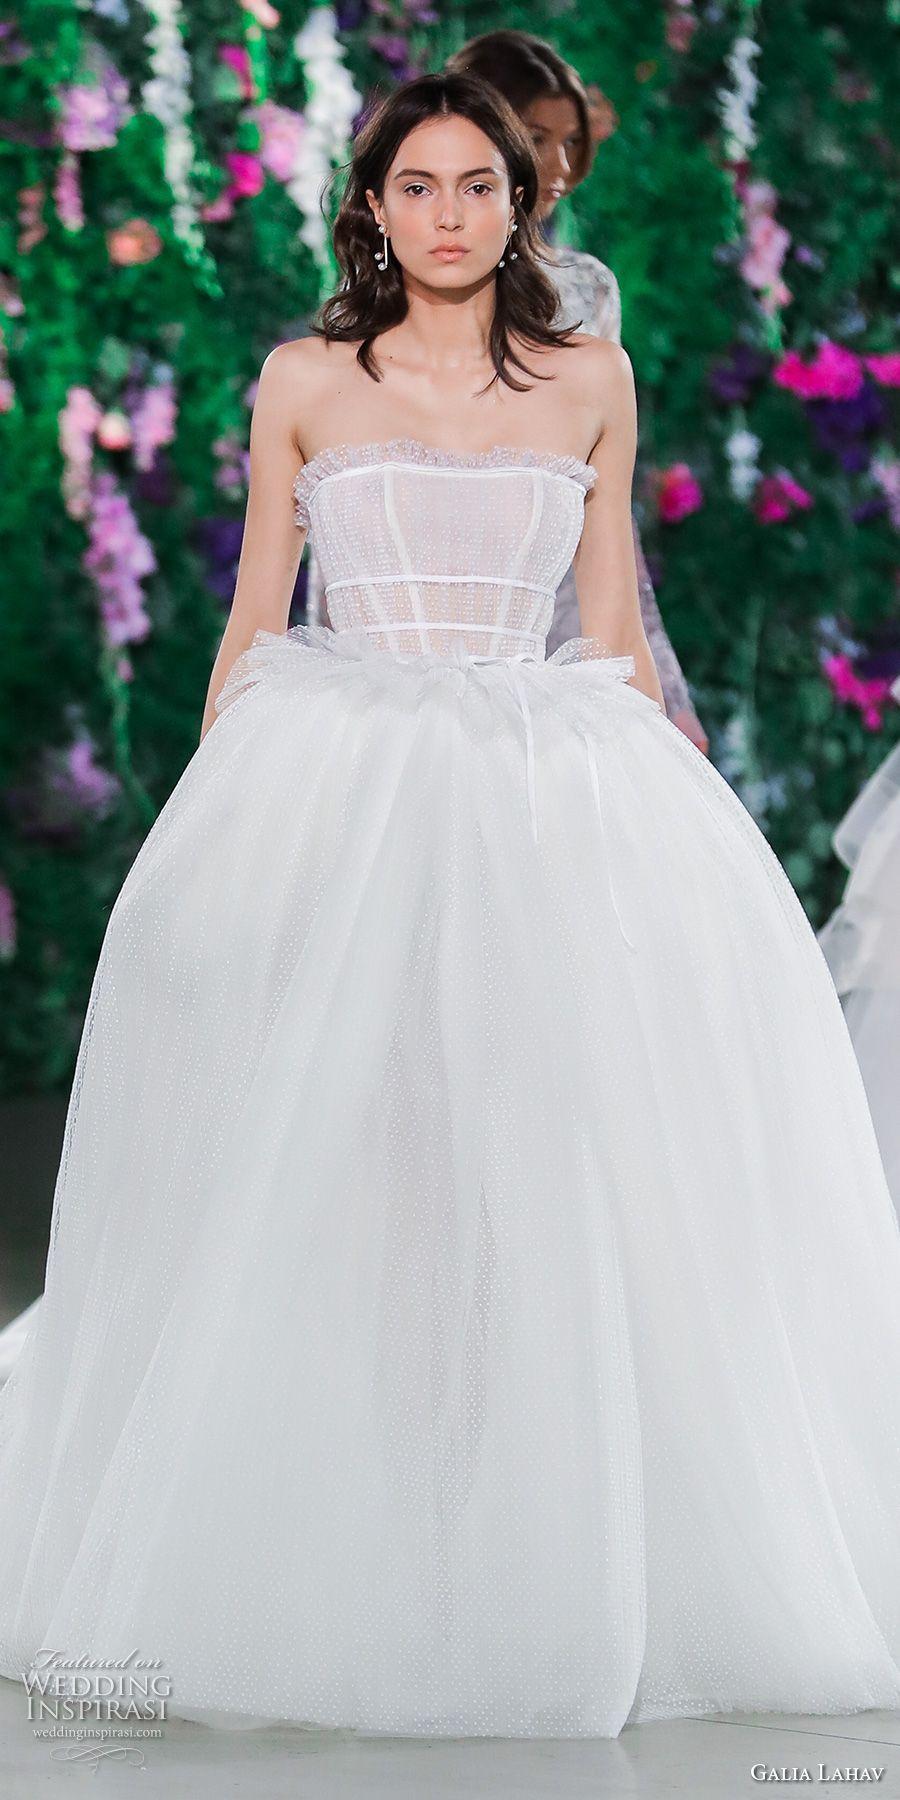 Galia lahav couture fall bridal runway show u ucflorence by